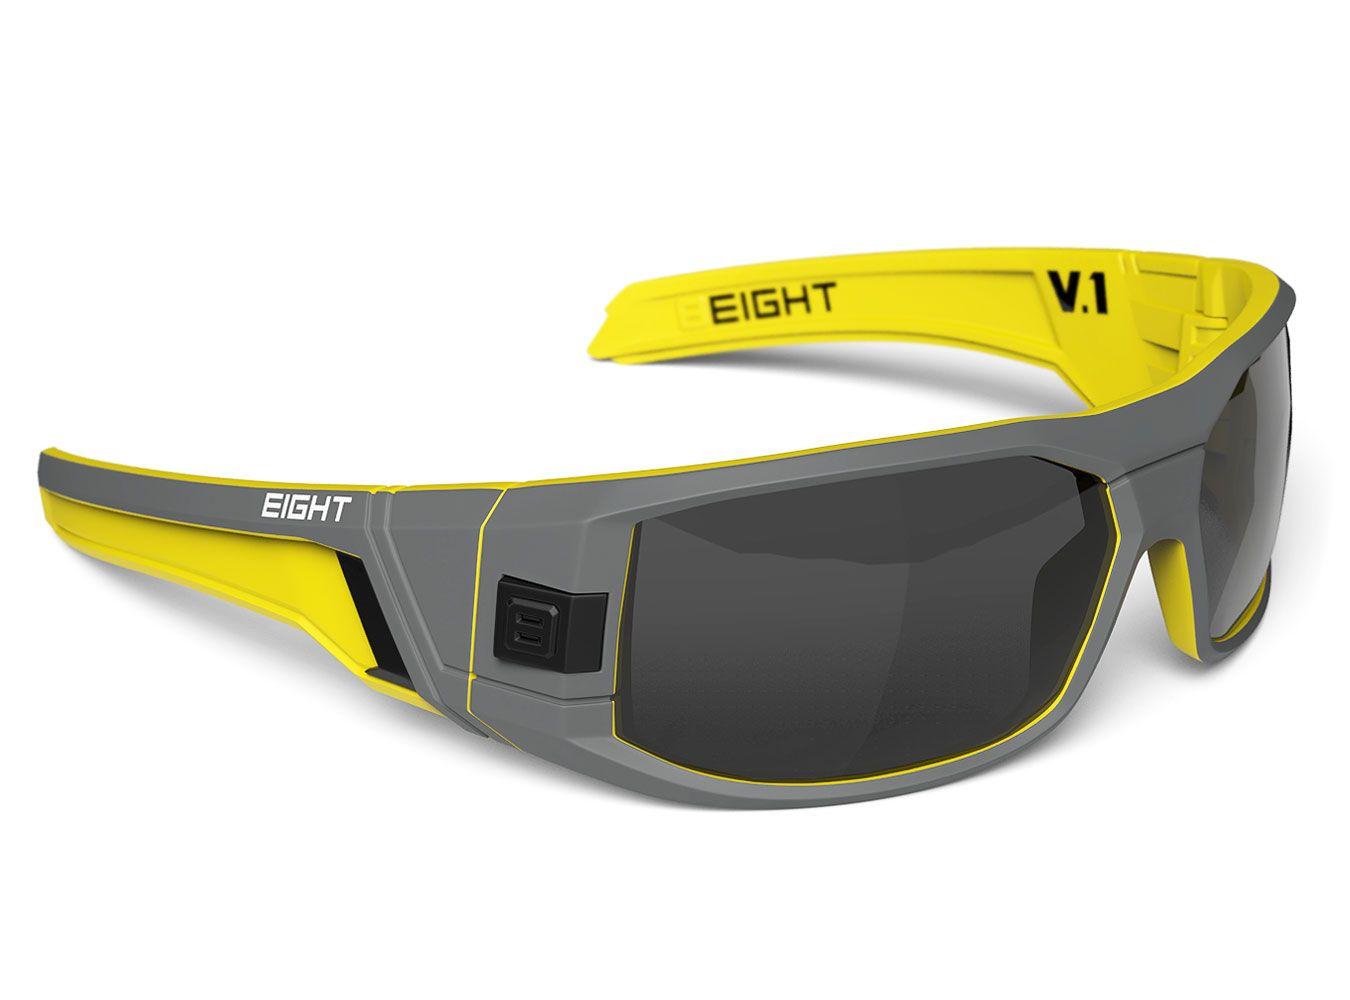 2d9887697ba Matte Gray Yellow V.1 sunglasses from EIGHT Eyewear WWW.IWEAR8.COM   8eyewear  sunglasses  shades  cool  mensfashion  fashion  style  summer   eight  sports   ...